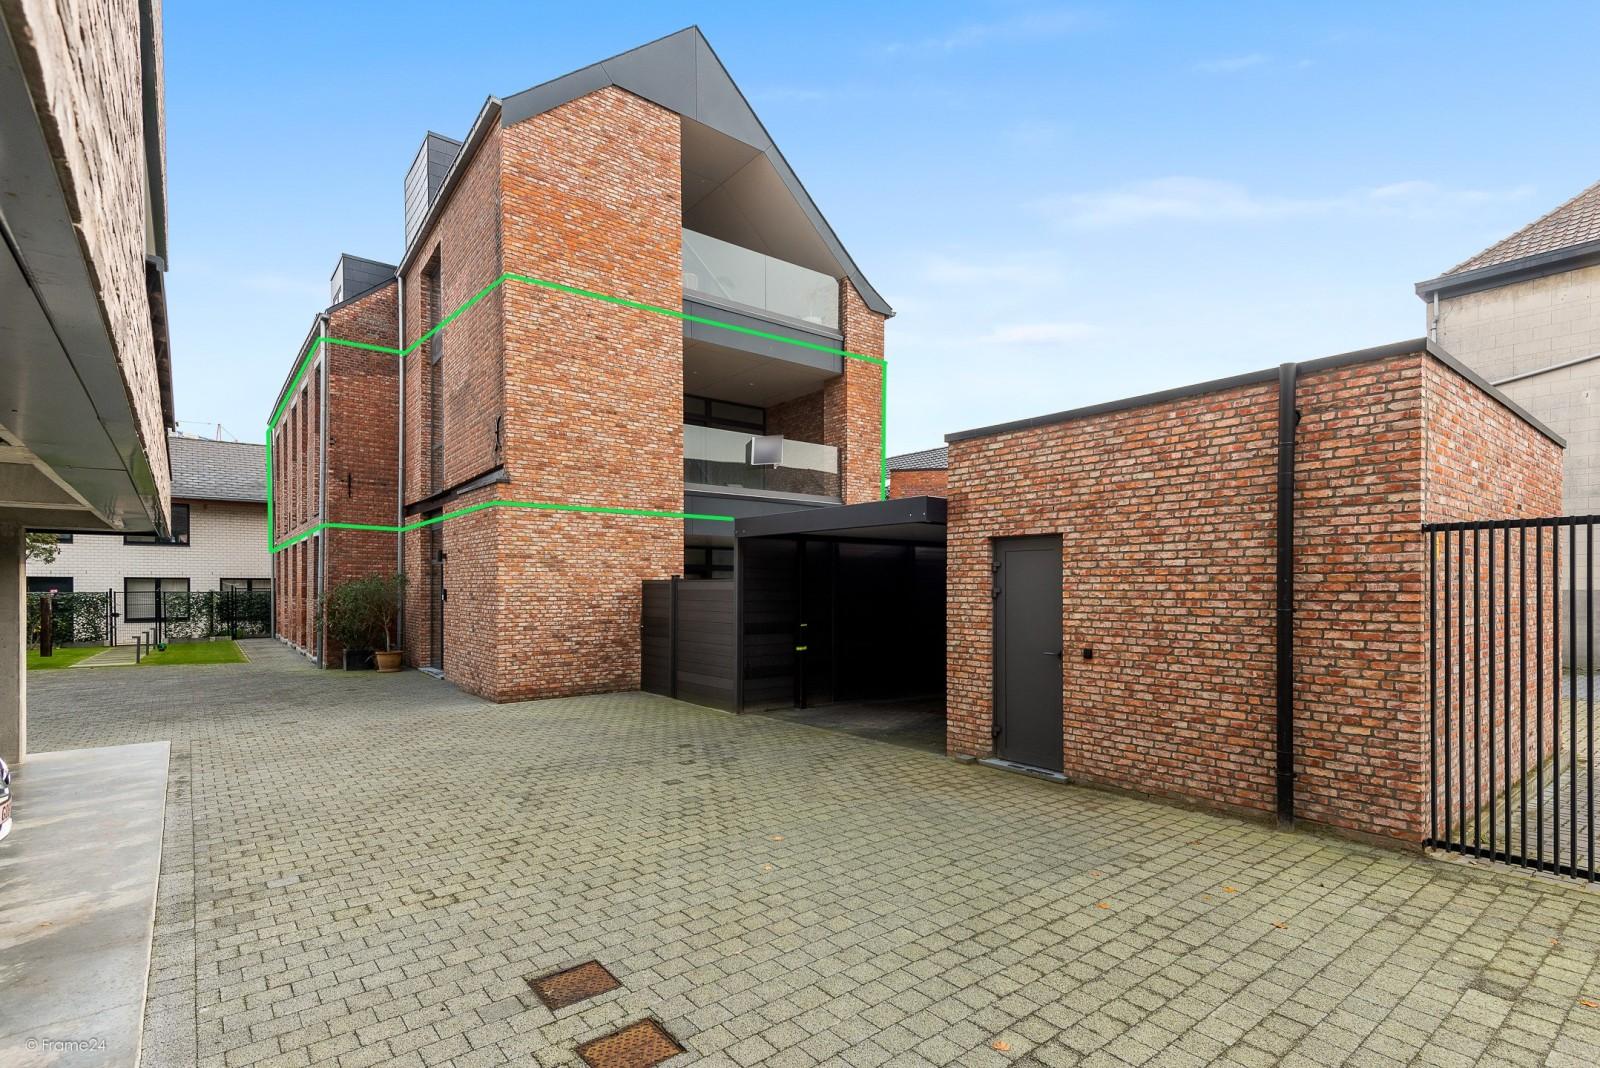 Riant vernieuwd appartement (147 m²) op centrale ligging te Walem! afbeelding 1